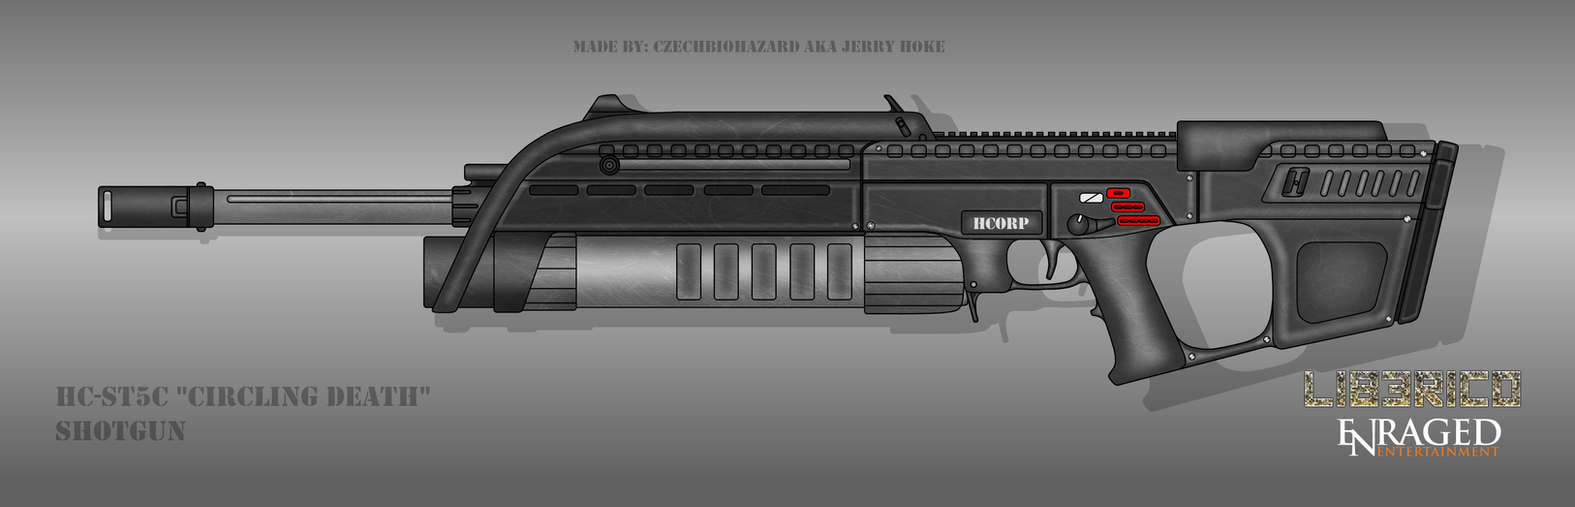 Fictional Firearm: HC-ST5C Automatic Shotgun by CzechBiohazard